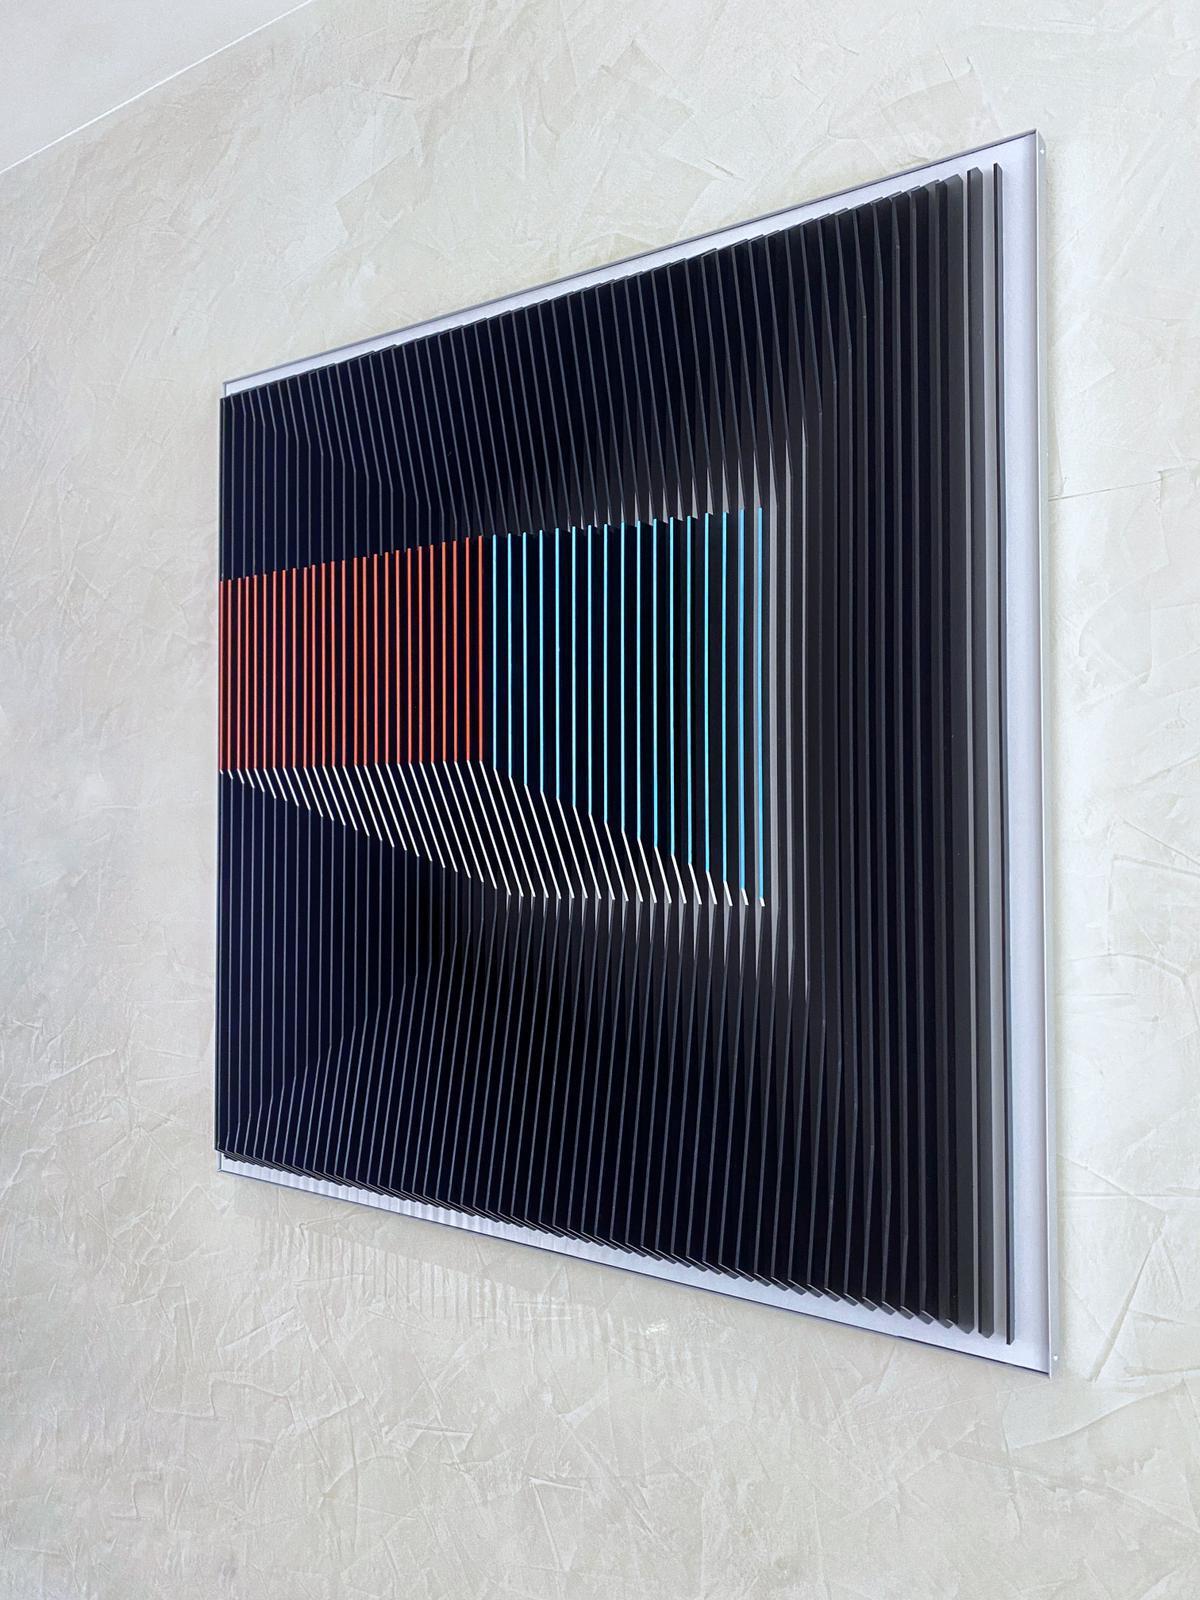 J. Margulis - Displaced Illusion IX - kinetic wall sculpture